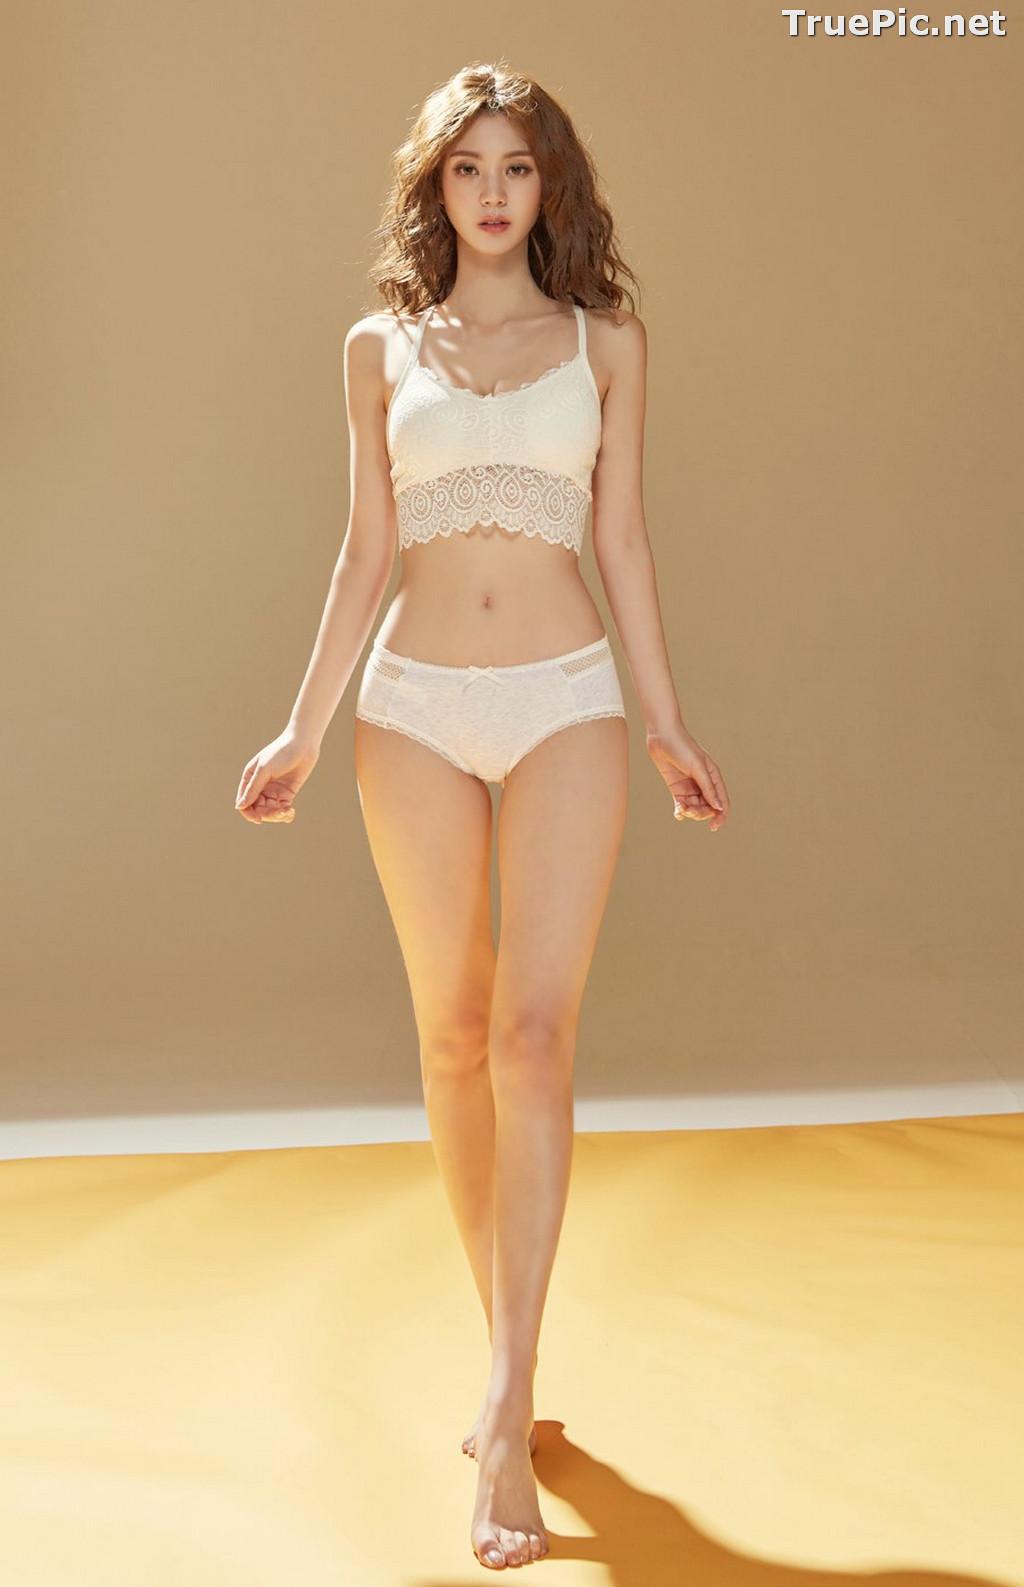 Image Korean Fashion Model – Lee Chae Eun (이채은) – Come On Vincent Lingerie #7 - TruePic.net - Picture-6